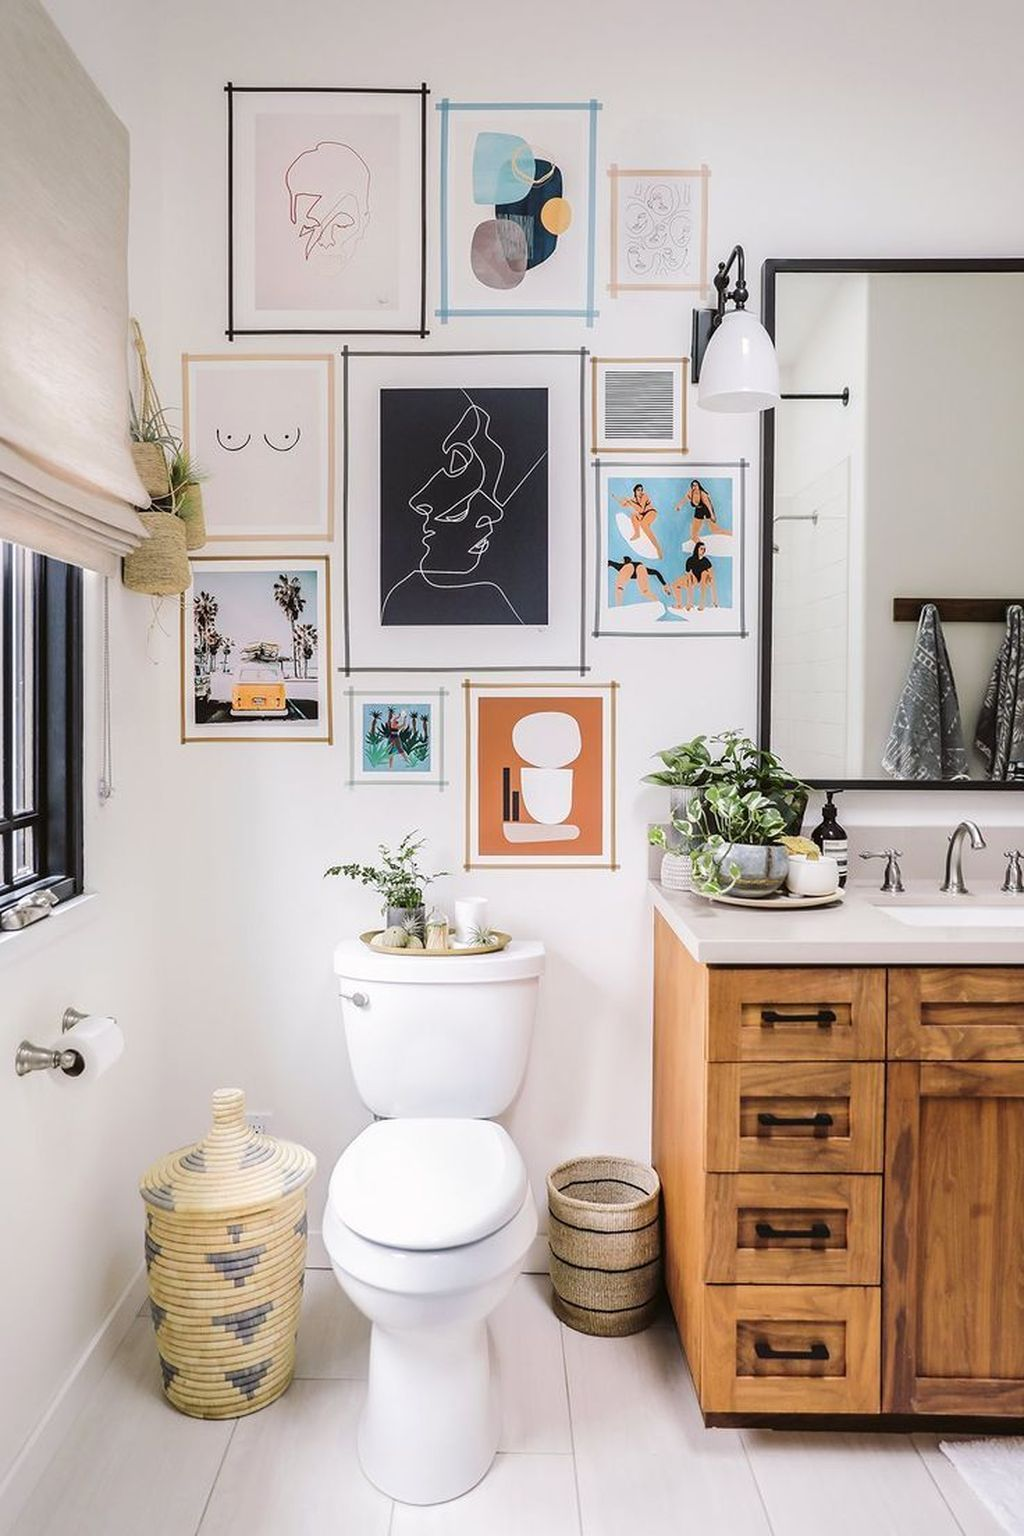 Bathroom Design White Contemporary Powder Room Sinks With Unique Shape Design And Mod Minimalist Bathroom Design Bathroom Vanity Designs Bathroom Design Small